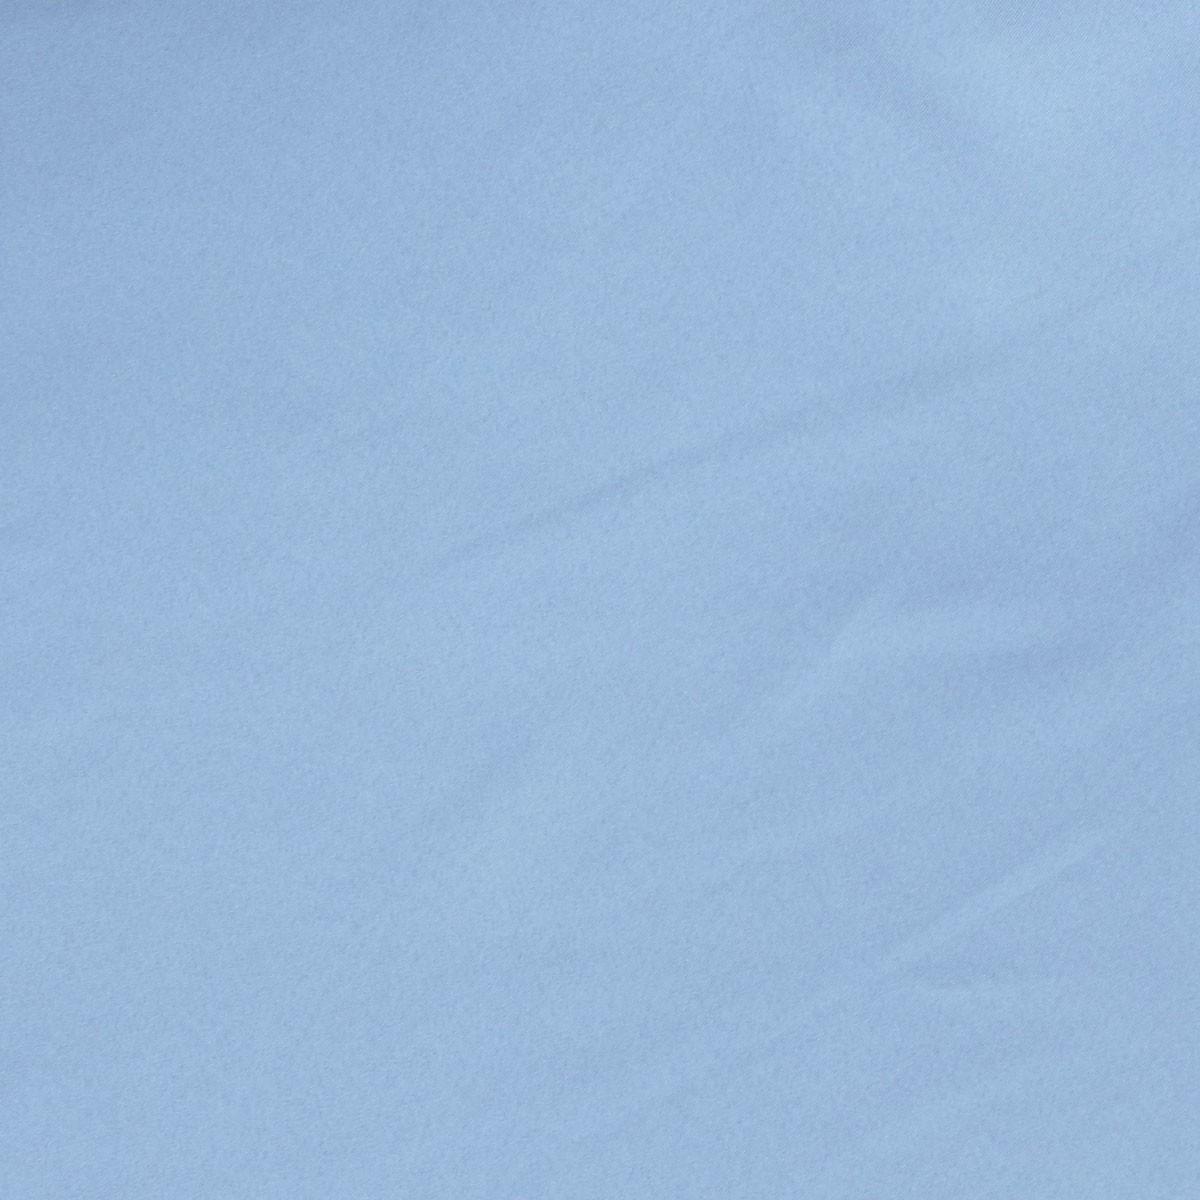 Kreativstoff Universalstoff Polyester Stretch hellblau